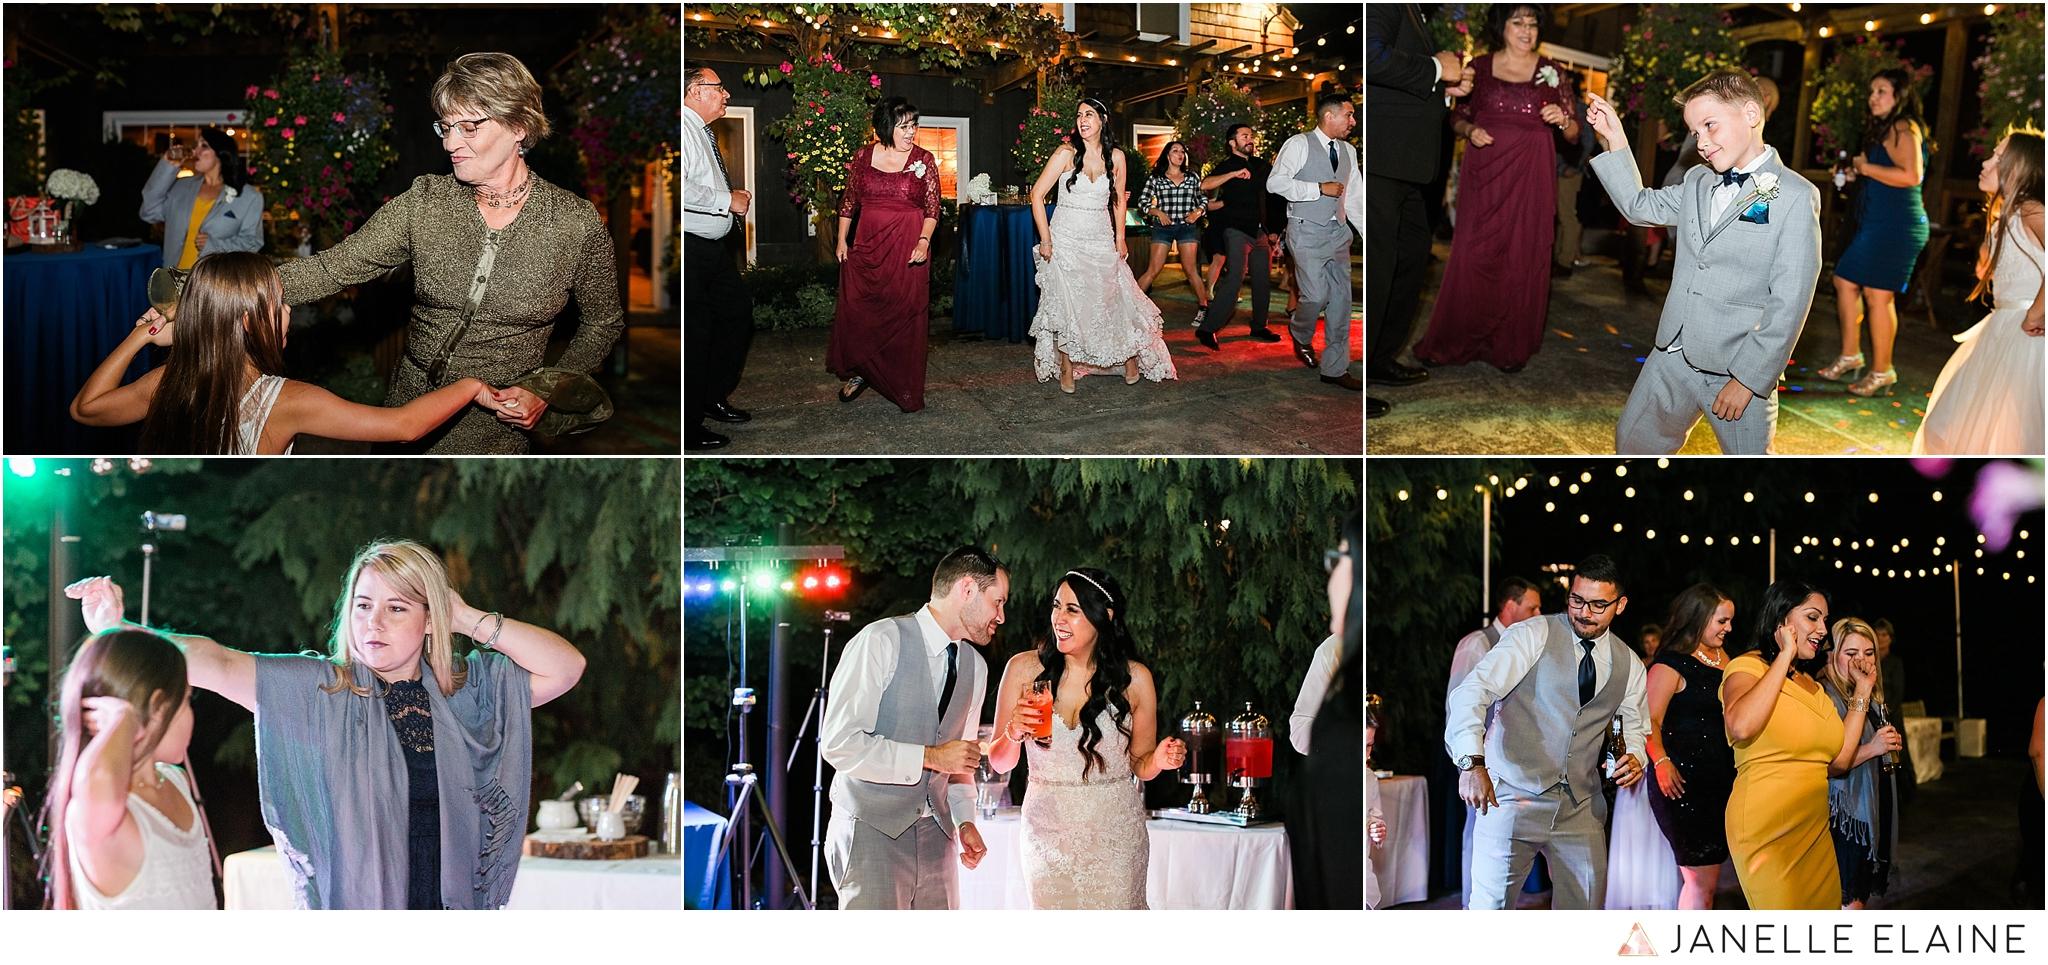 janelle elaine photography-professional wedding photographer-seattle-bellevue-robinswood house-288.jpg